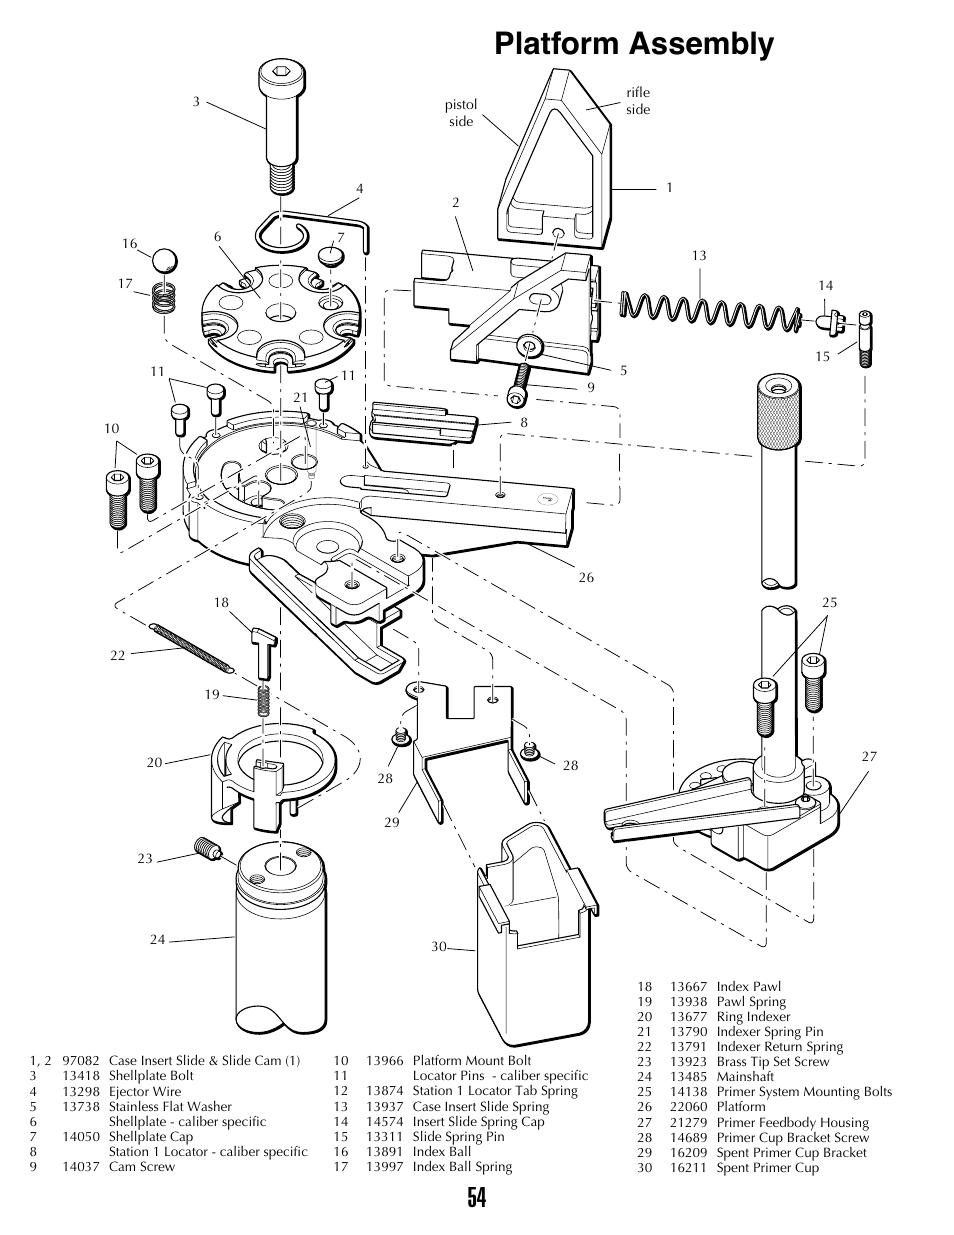 dillon precision xl 650 page53 platform assembly dillon precision xl 650 user manual page 53 59